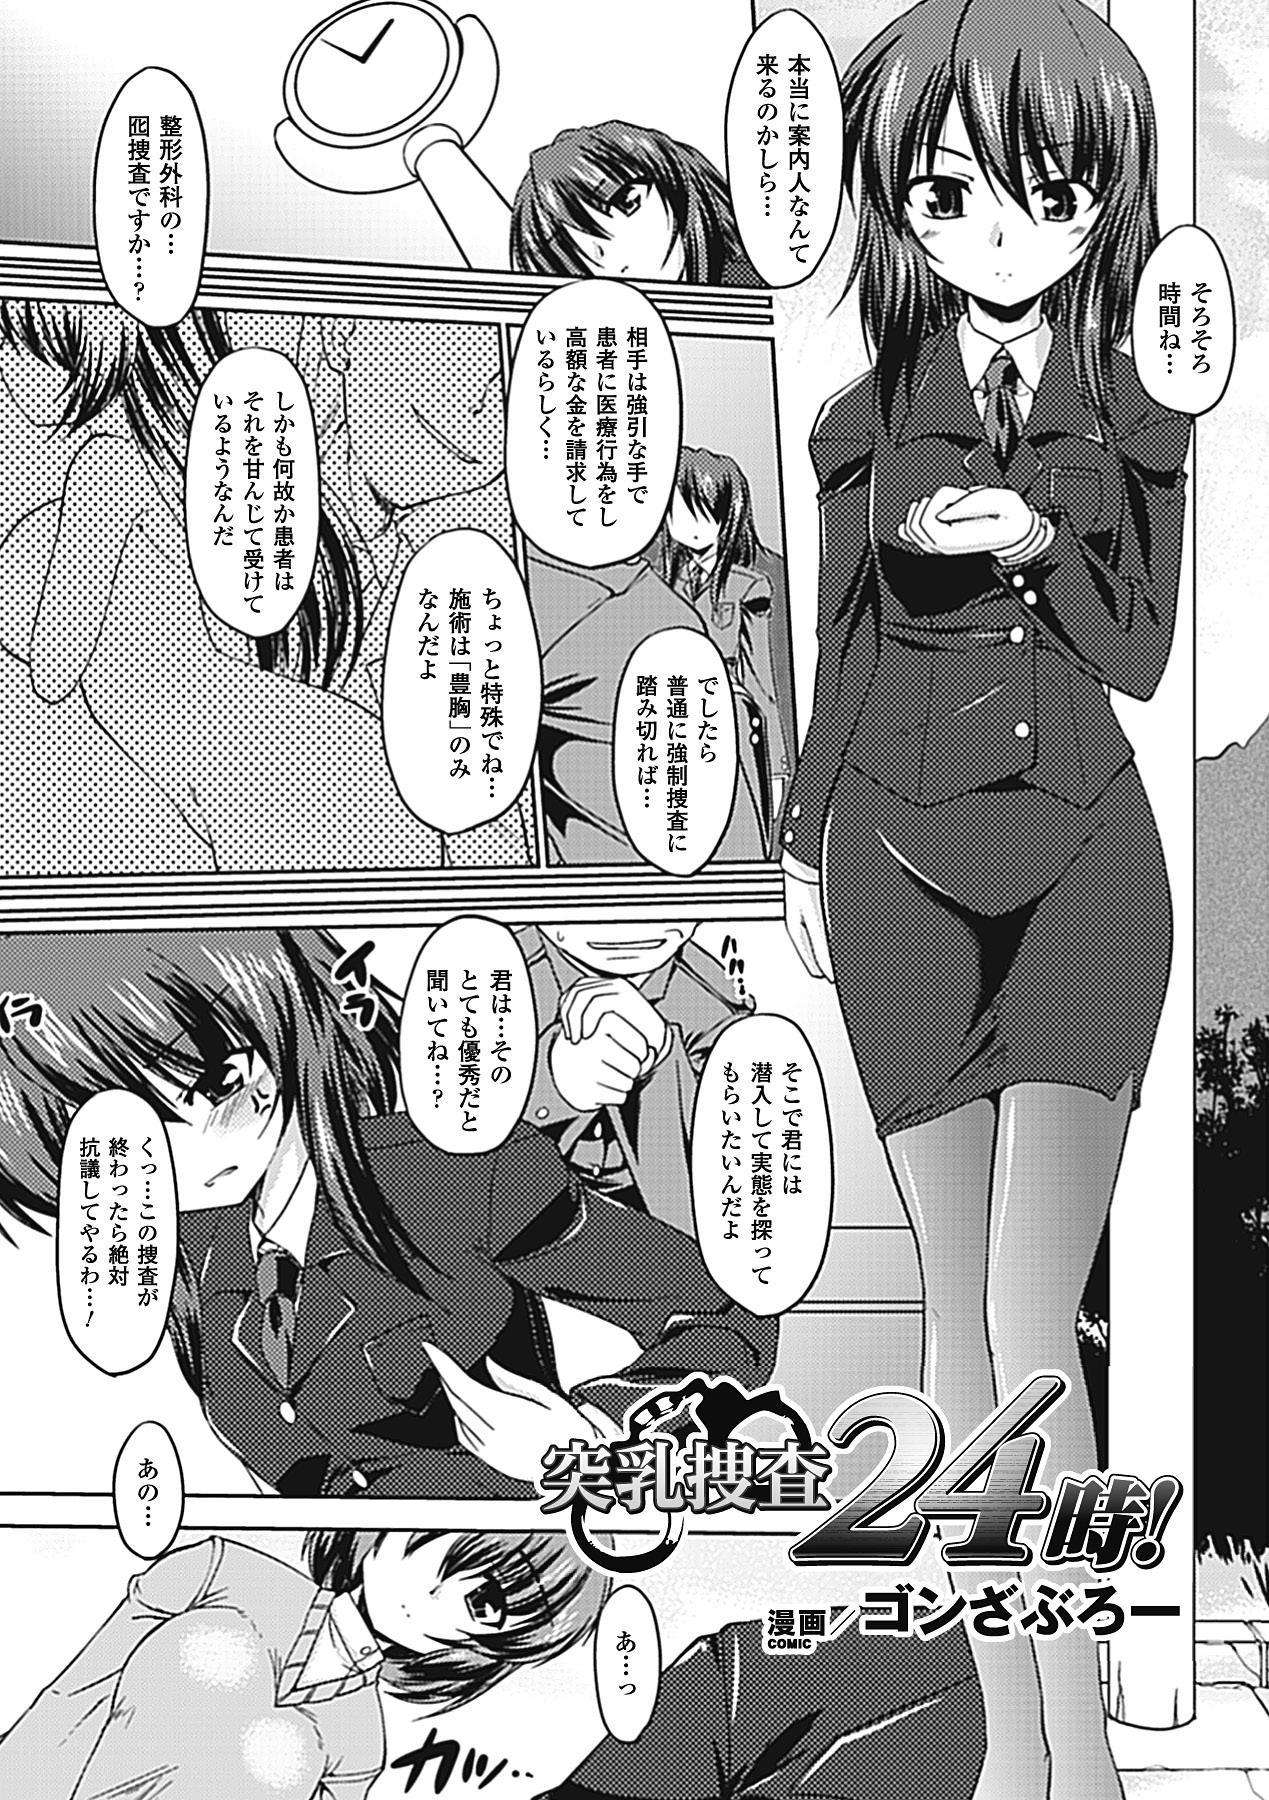 Megami Crisis 5 124